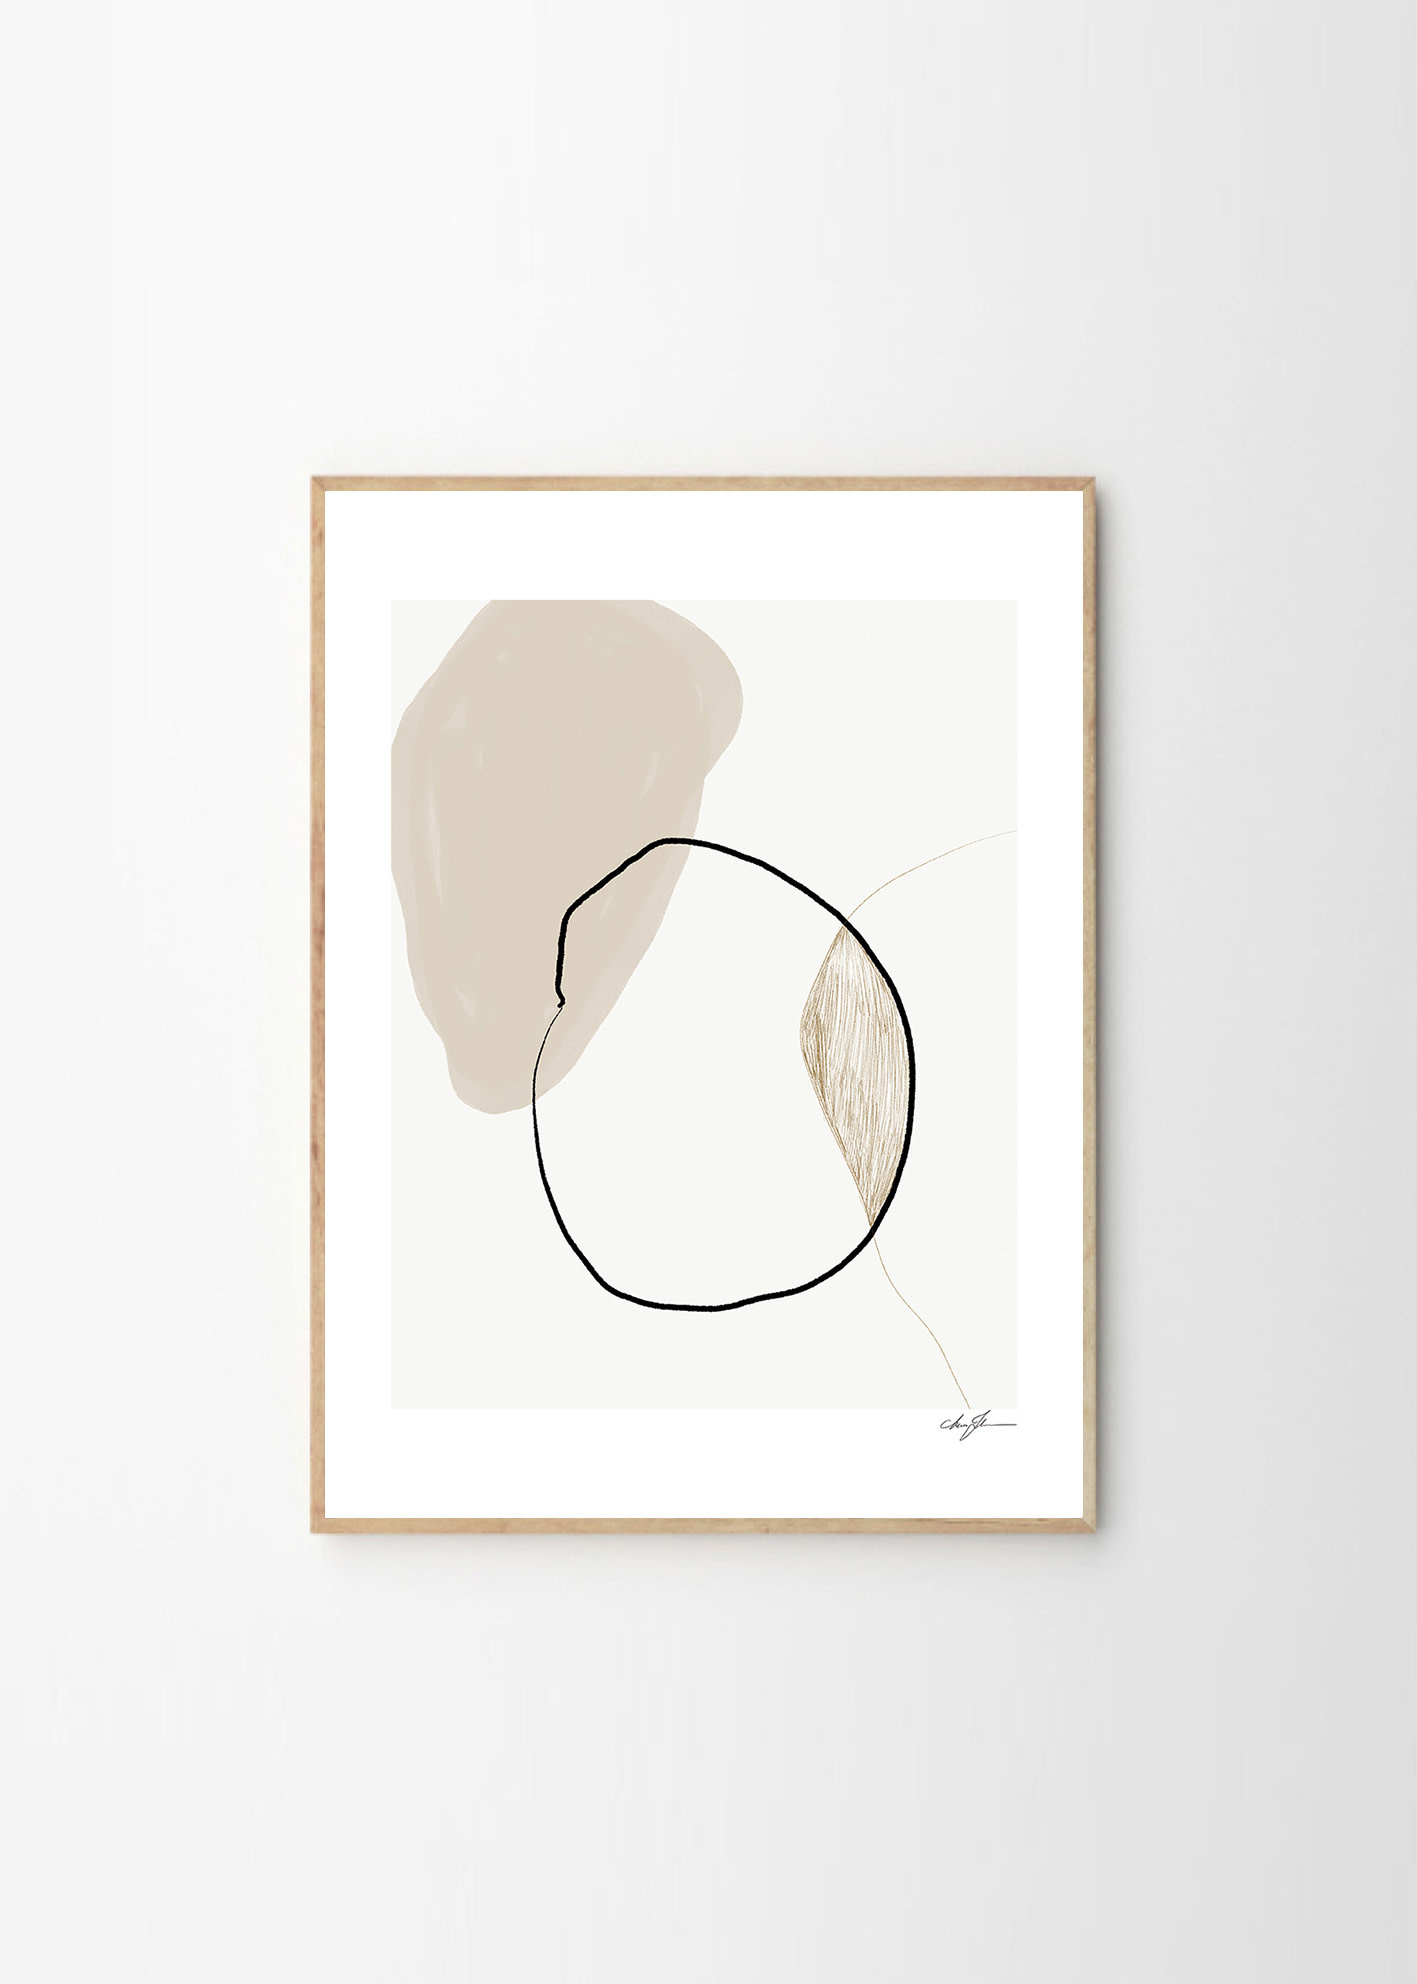 Pairs - Anna Johansson - 30x40cm - frame black solid oak-1